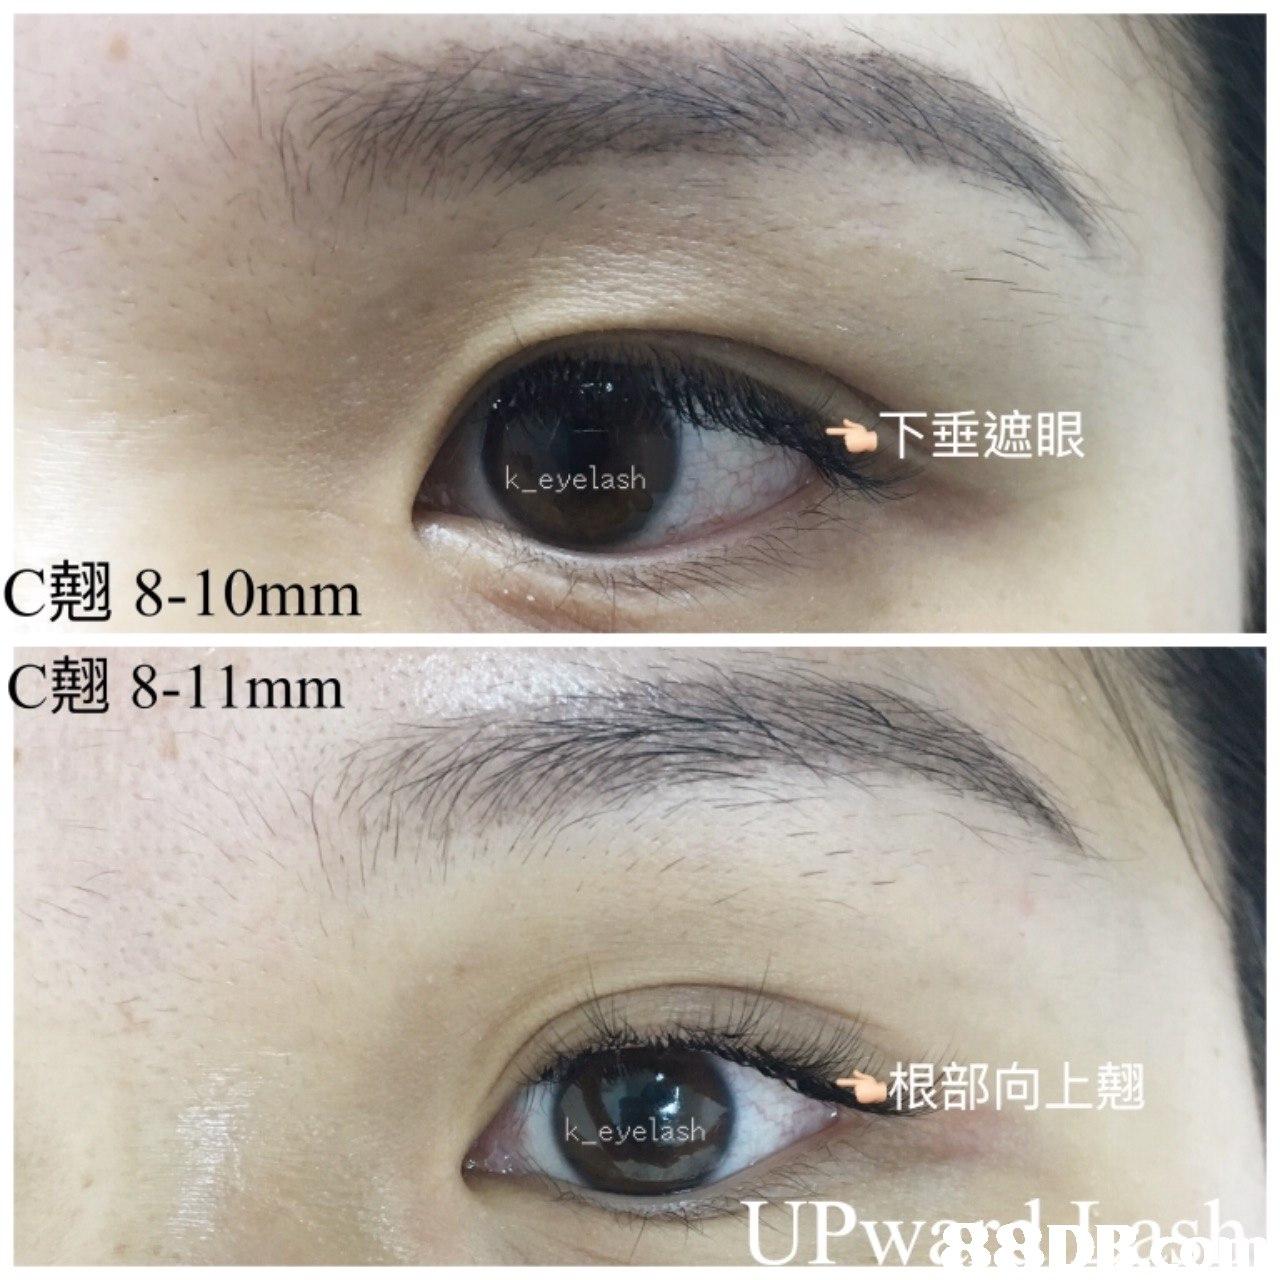 下垂遮眼 k_eyelash C堯羽8-10mm C 羽8-11 mm 根部向上翹 k eyeläsh UPw  eyebrow,eyelash,eye,eye shadow,forehead